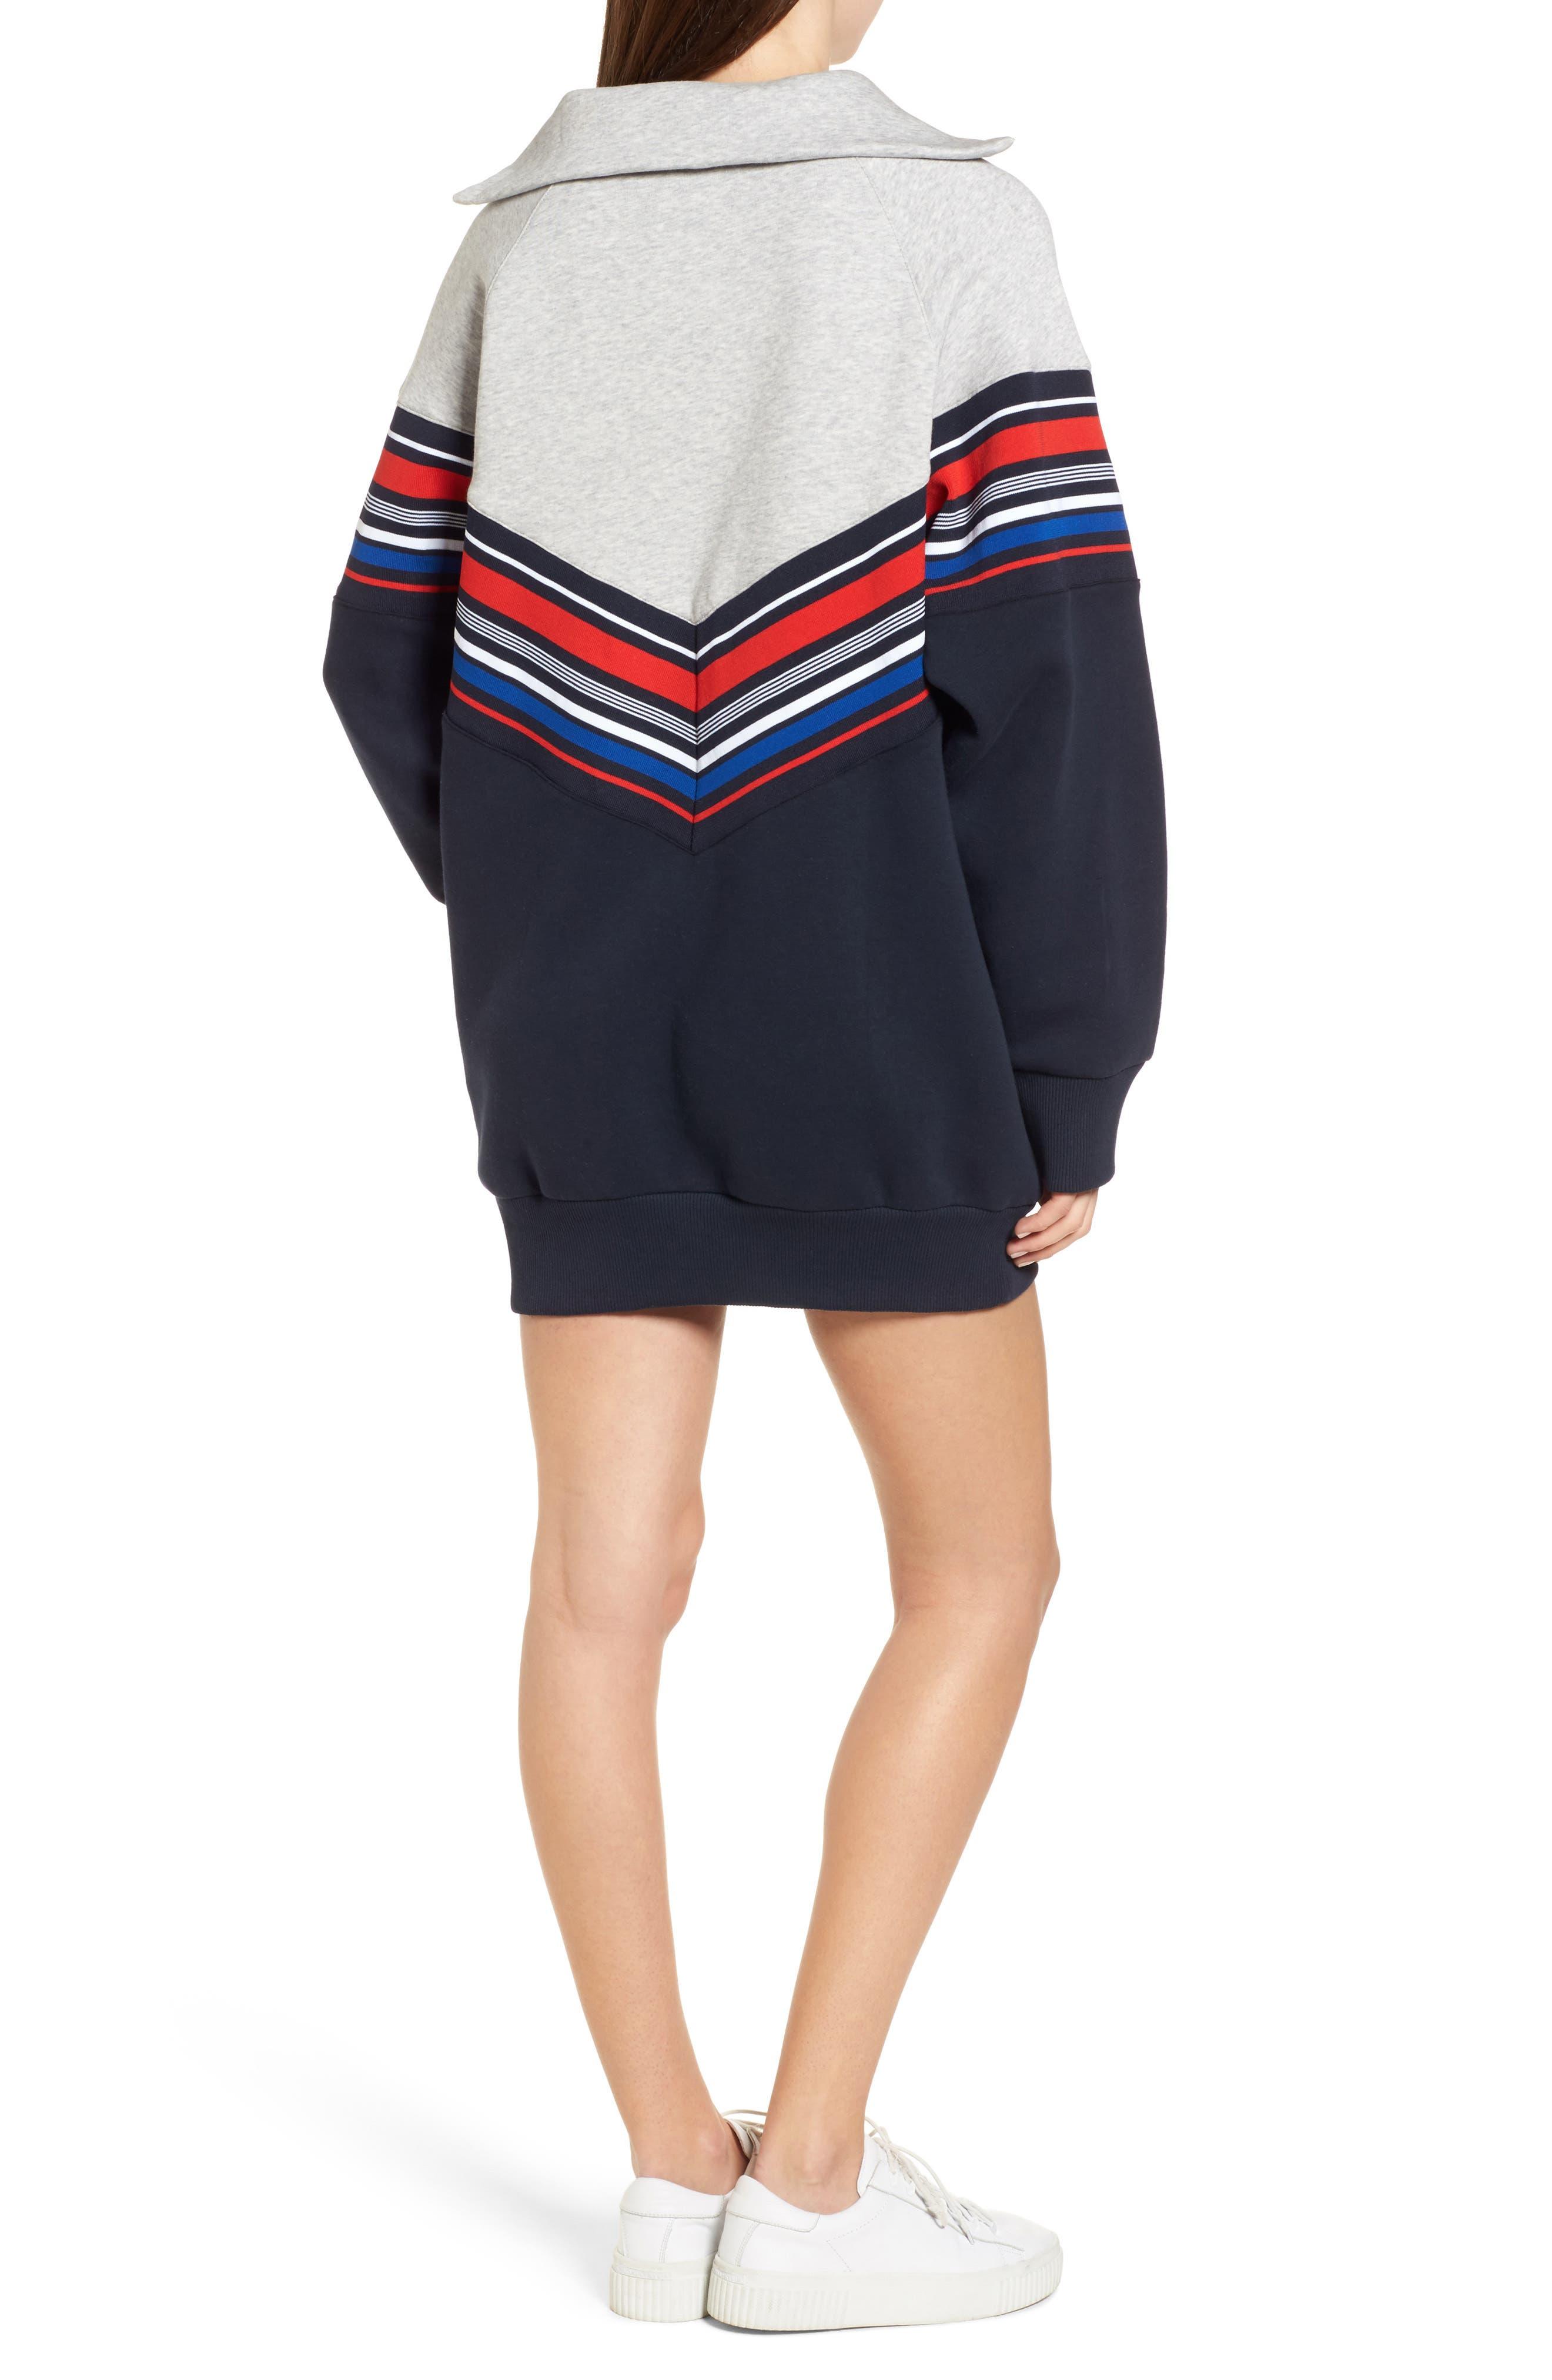 x Gigi Hadid Racing Sweatshirt Dress,                             Alternate thumbnail 2, color,                             405